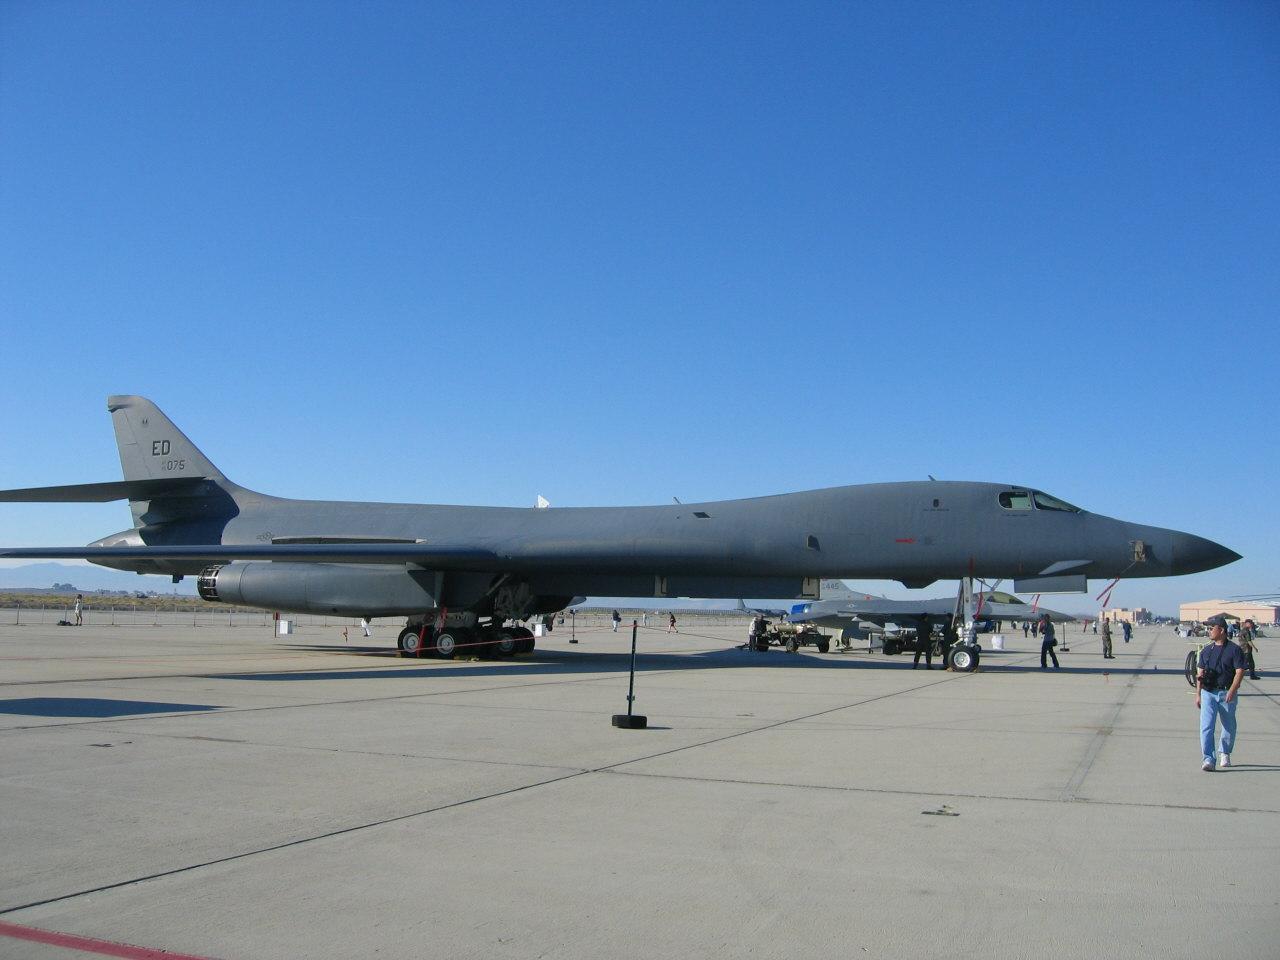 tapety b1 bomber l jpg 1024x768 1280x960